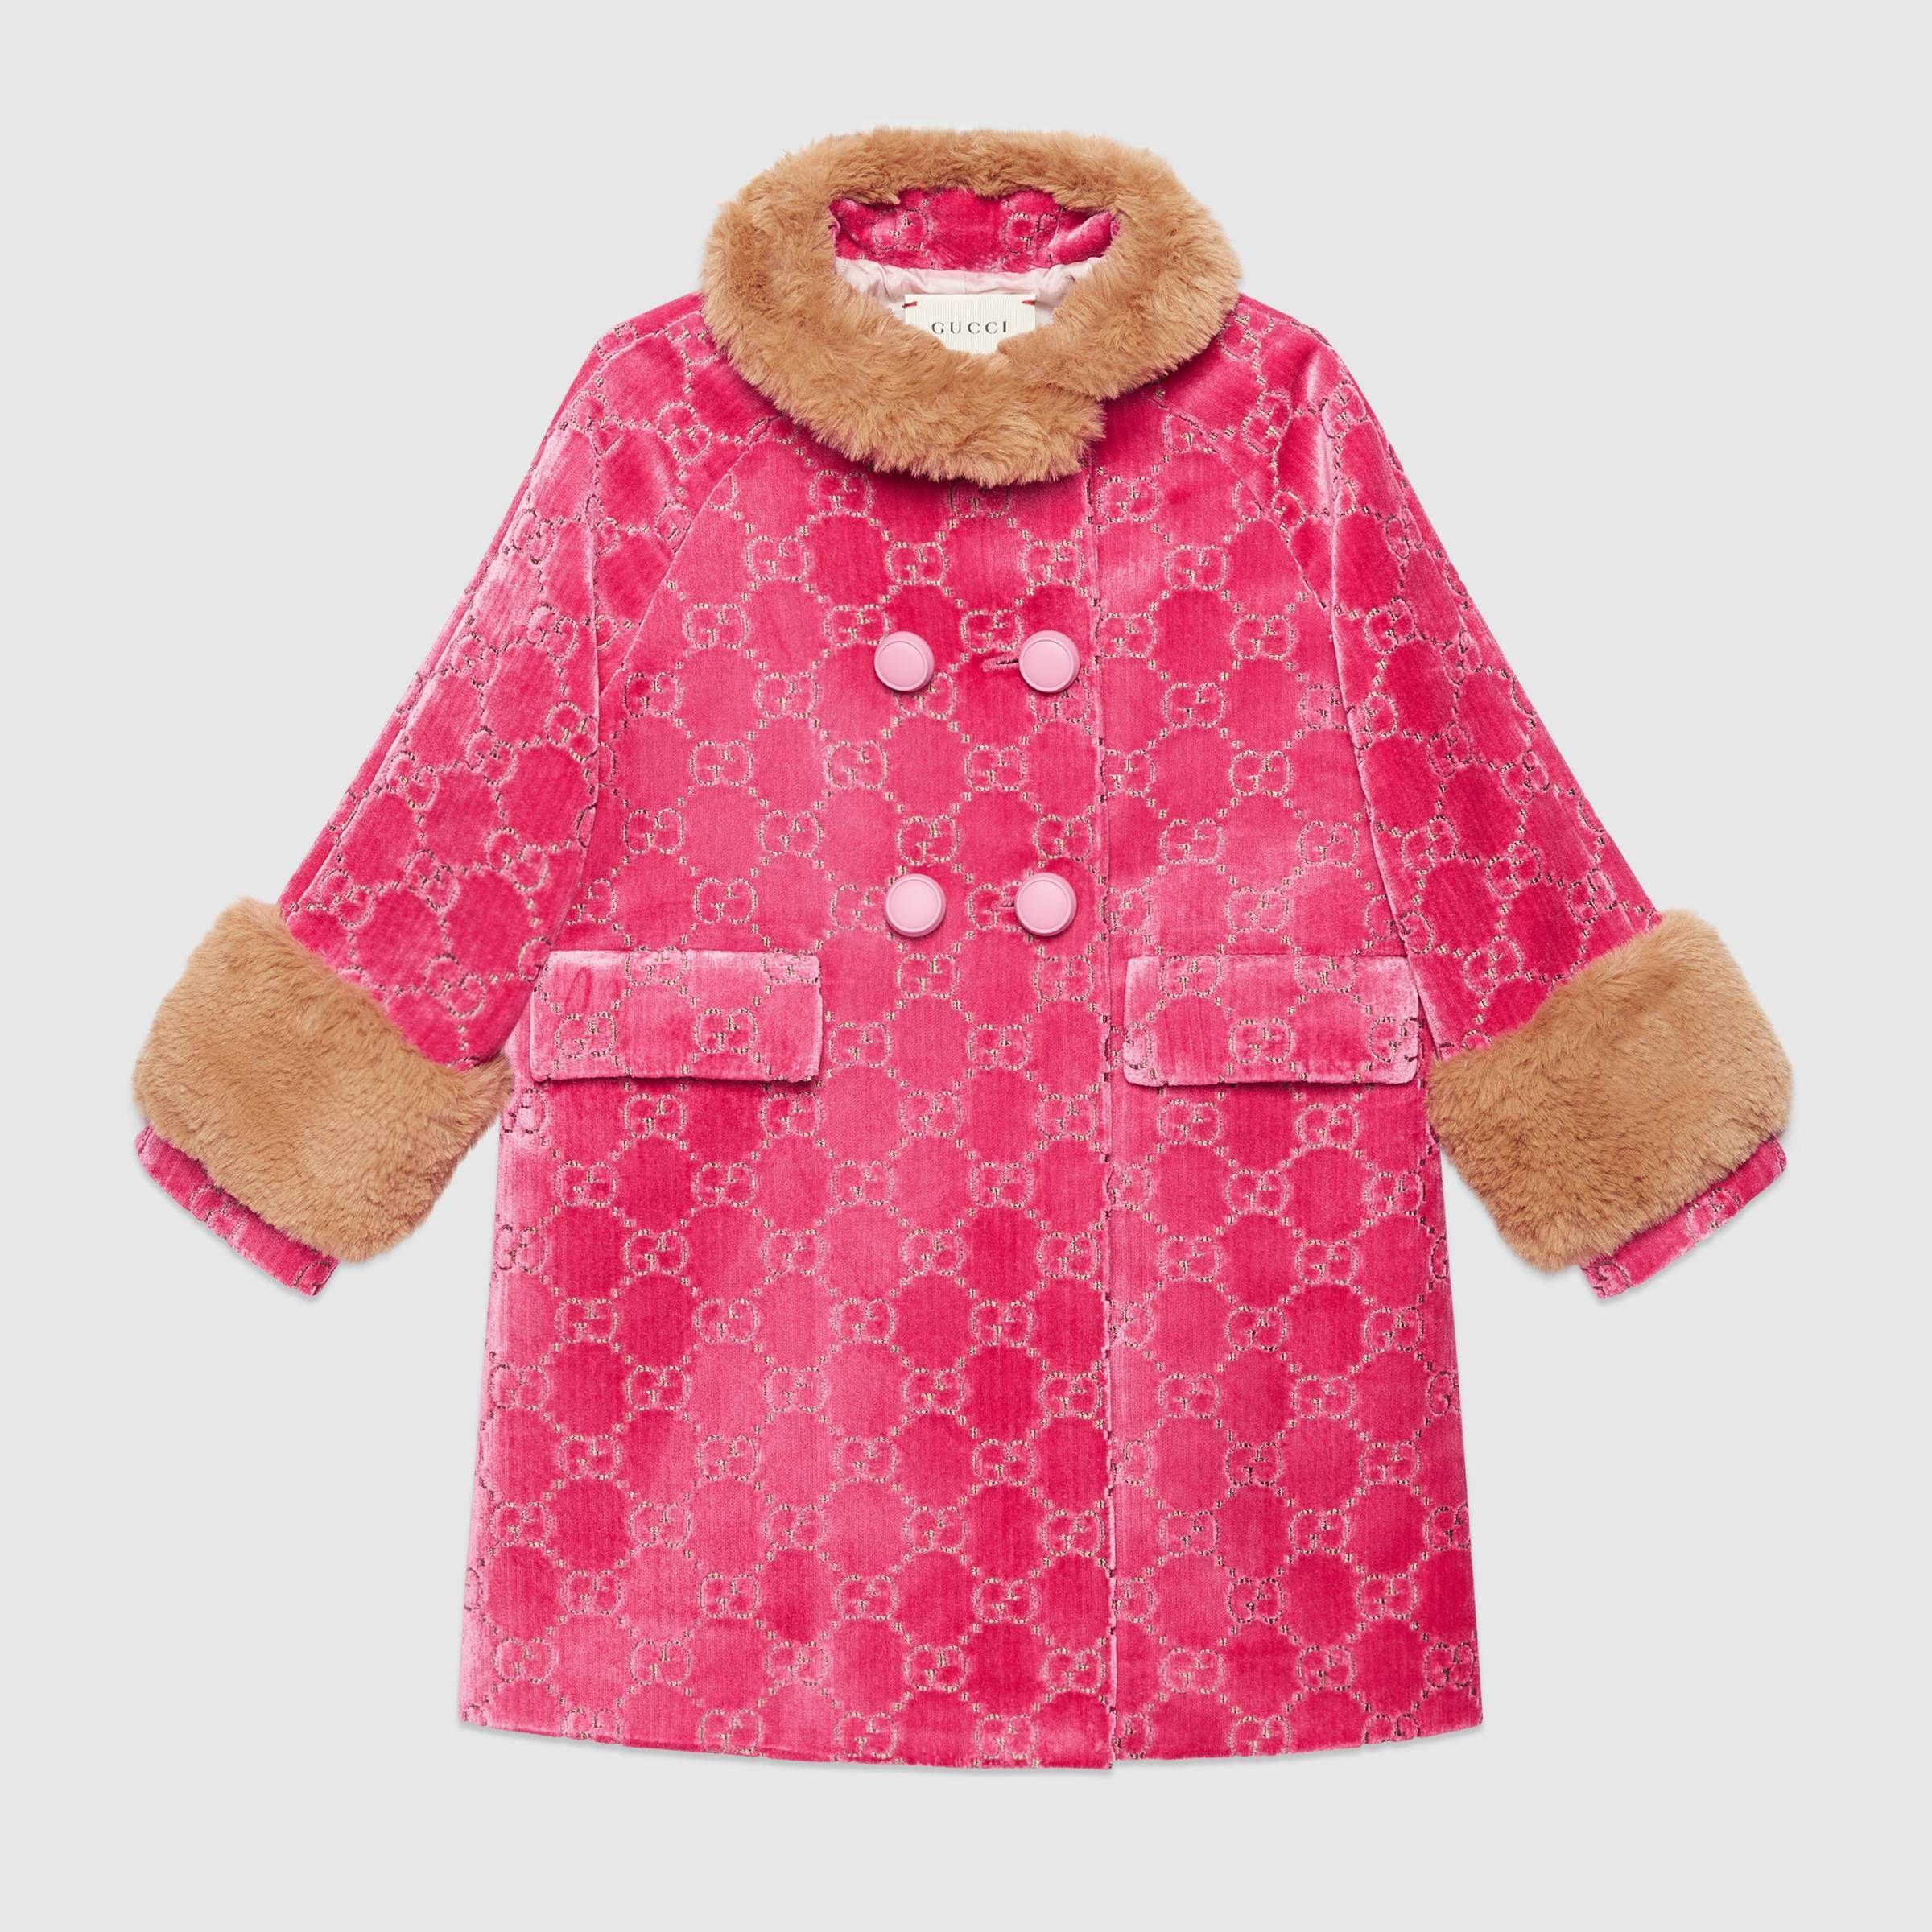 Children S Gg Velvet Coat In Pink Gg Velvet Gucci Girls Outerwear Jackets Luxury Baby Fashion Clothes Designer Baby Clothes [ 2400 x 2400 Pixel ]